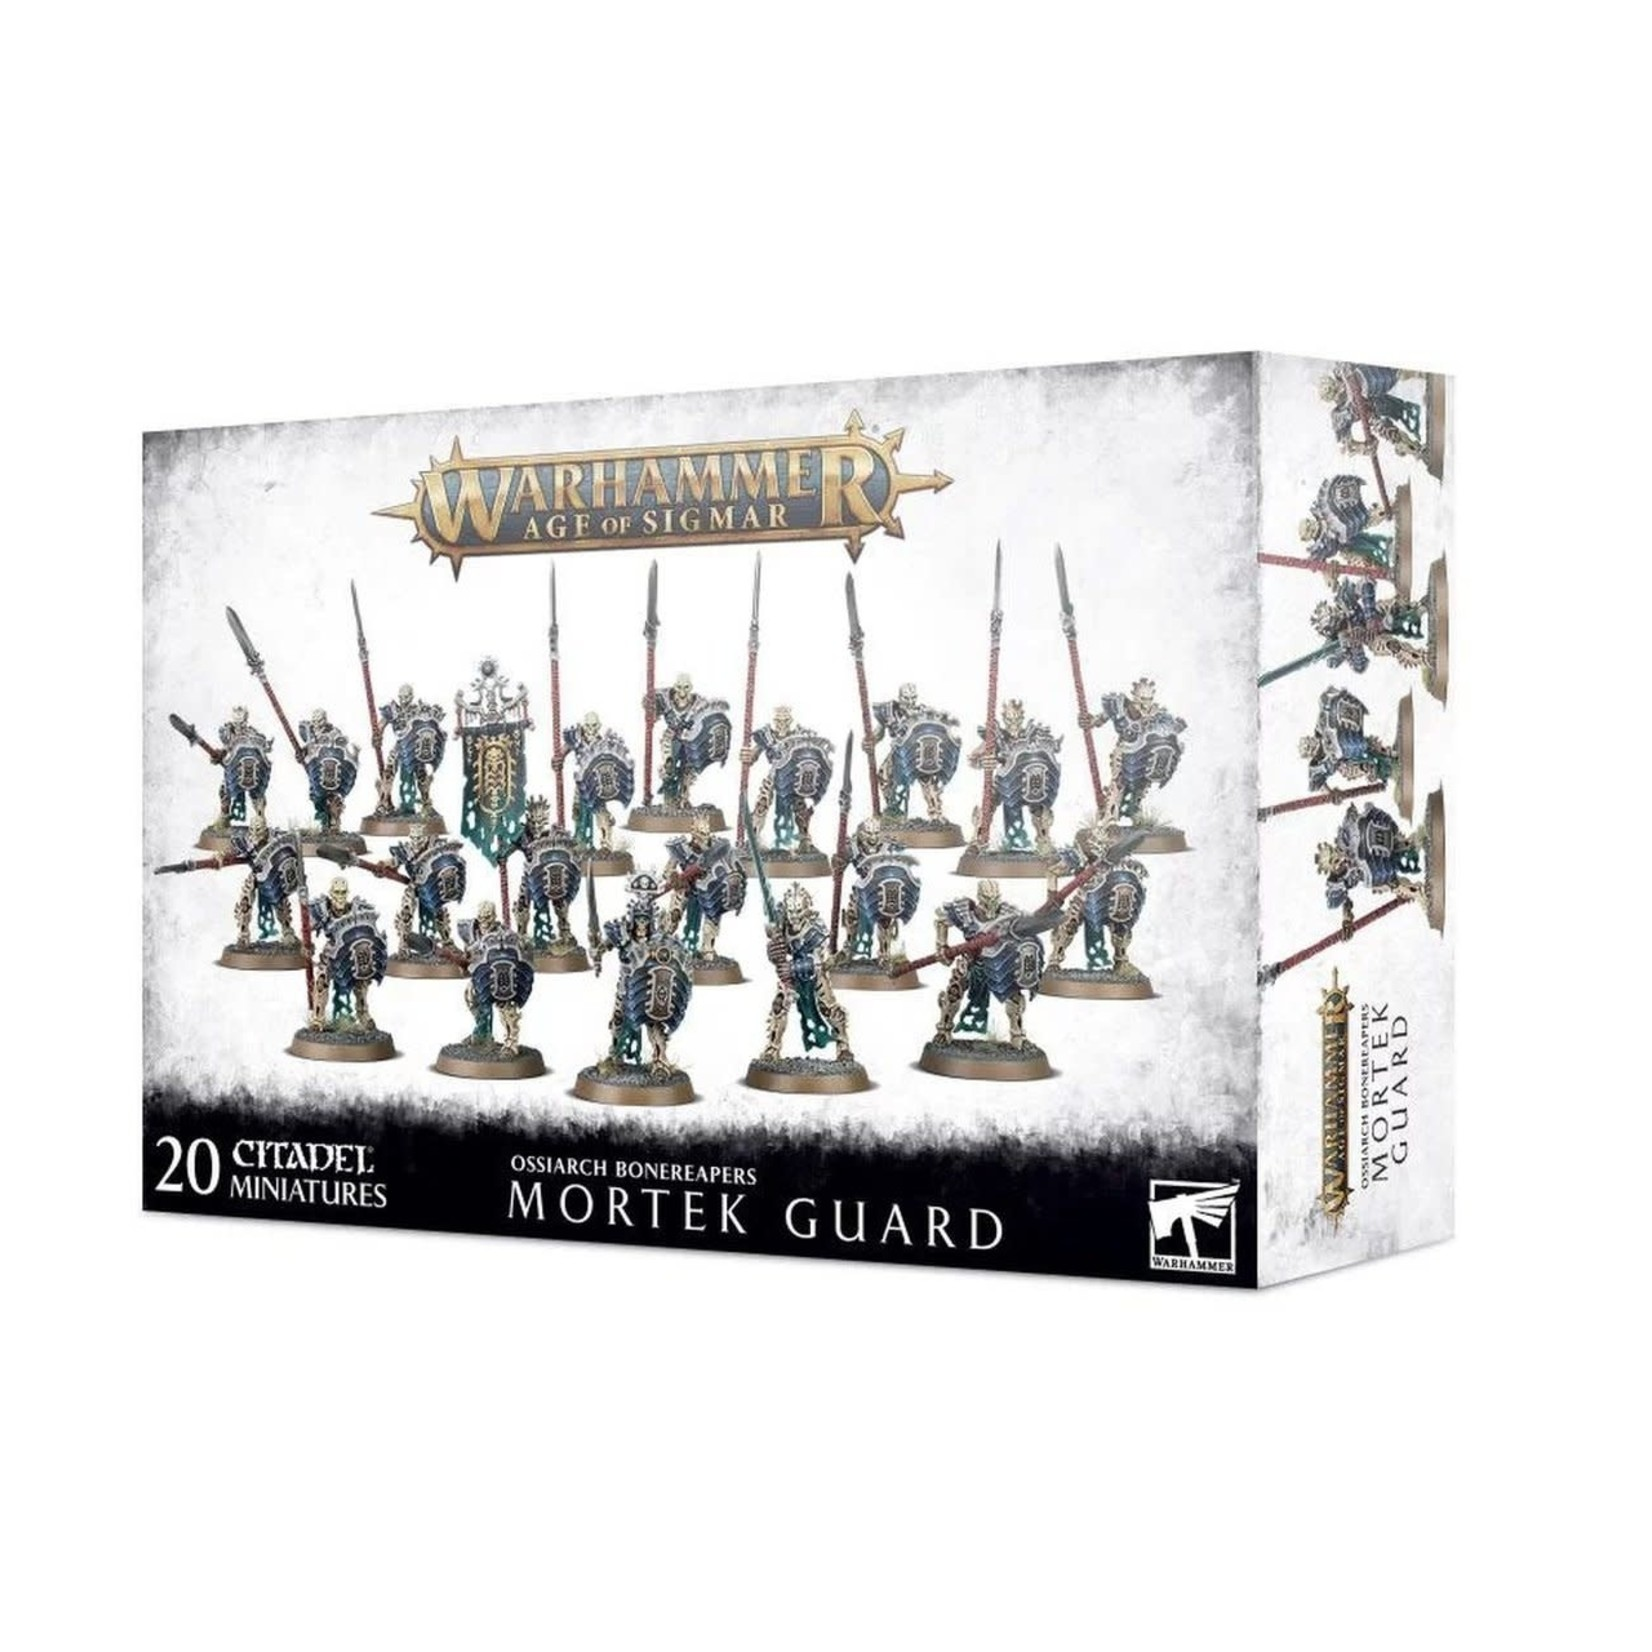 Games Workshop Warhammer Age of Sigmar: Ossiarch Bonereapers - Mortek Guard